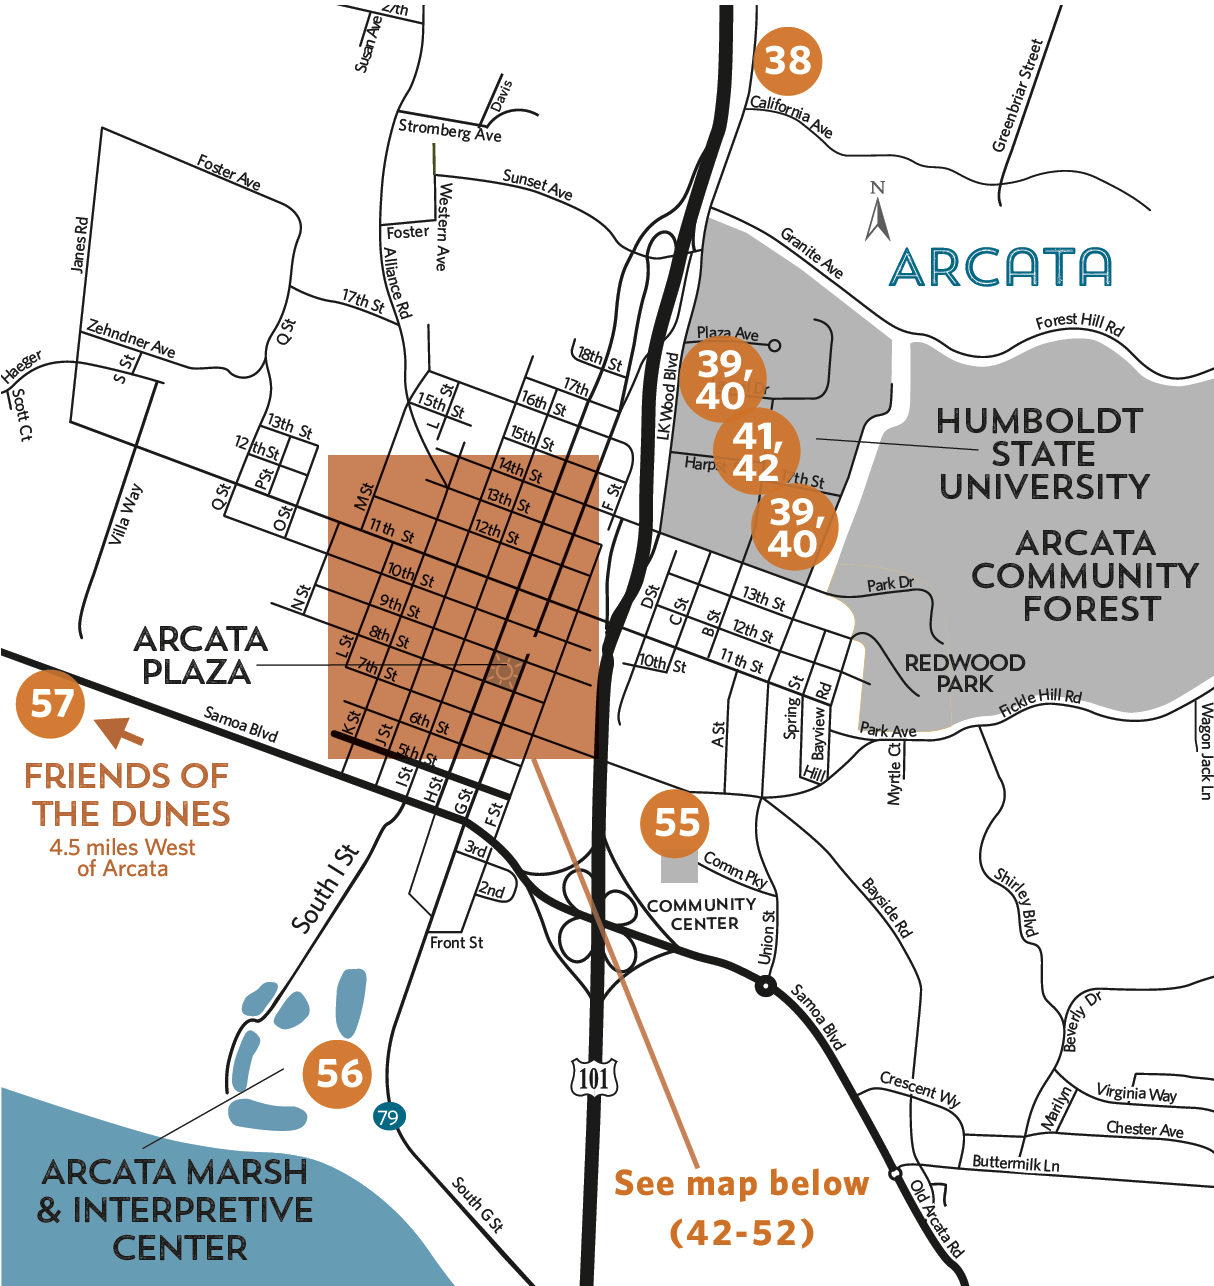 List of Locations - Arcata